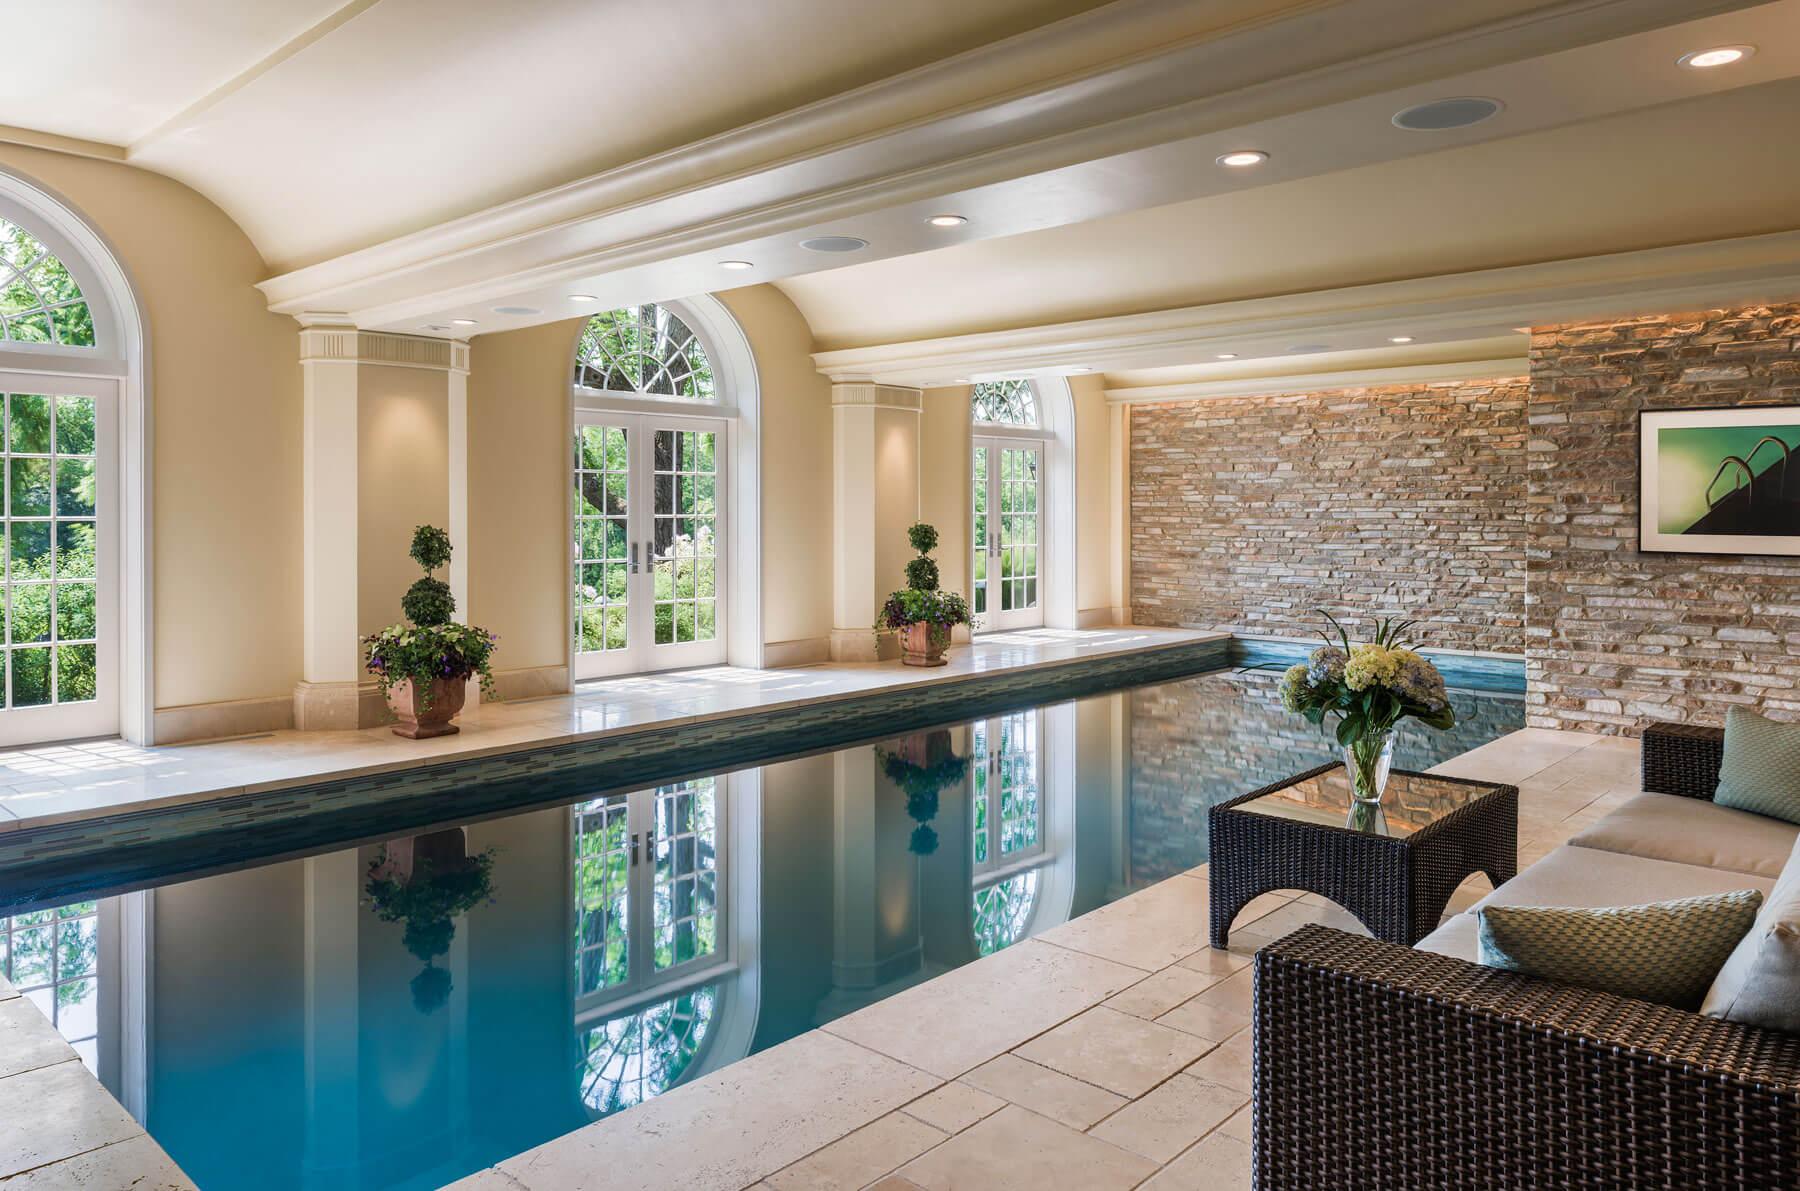 100 Home Lighting Design Consultant New Home Builders Design Studio Kb Home Glo London